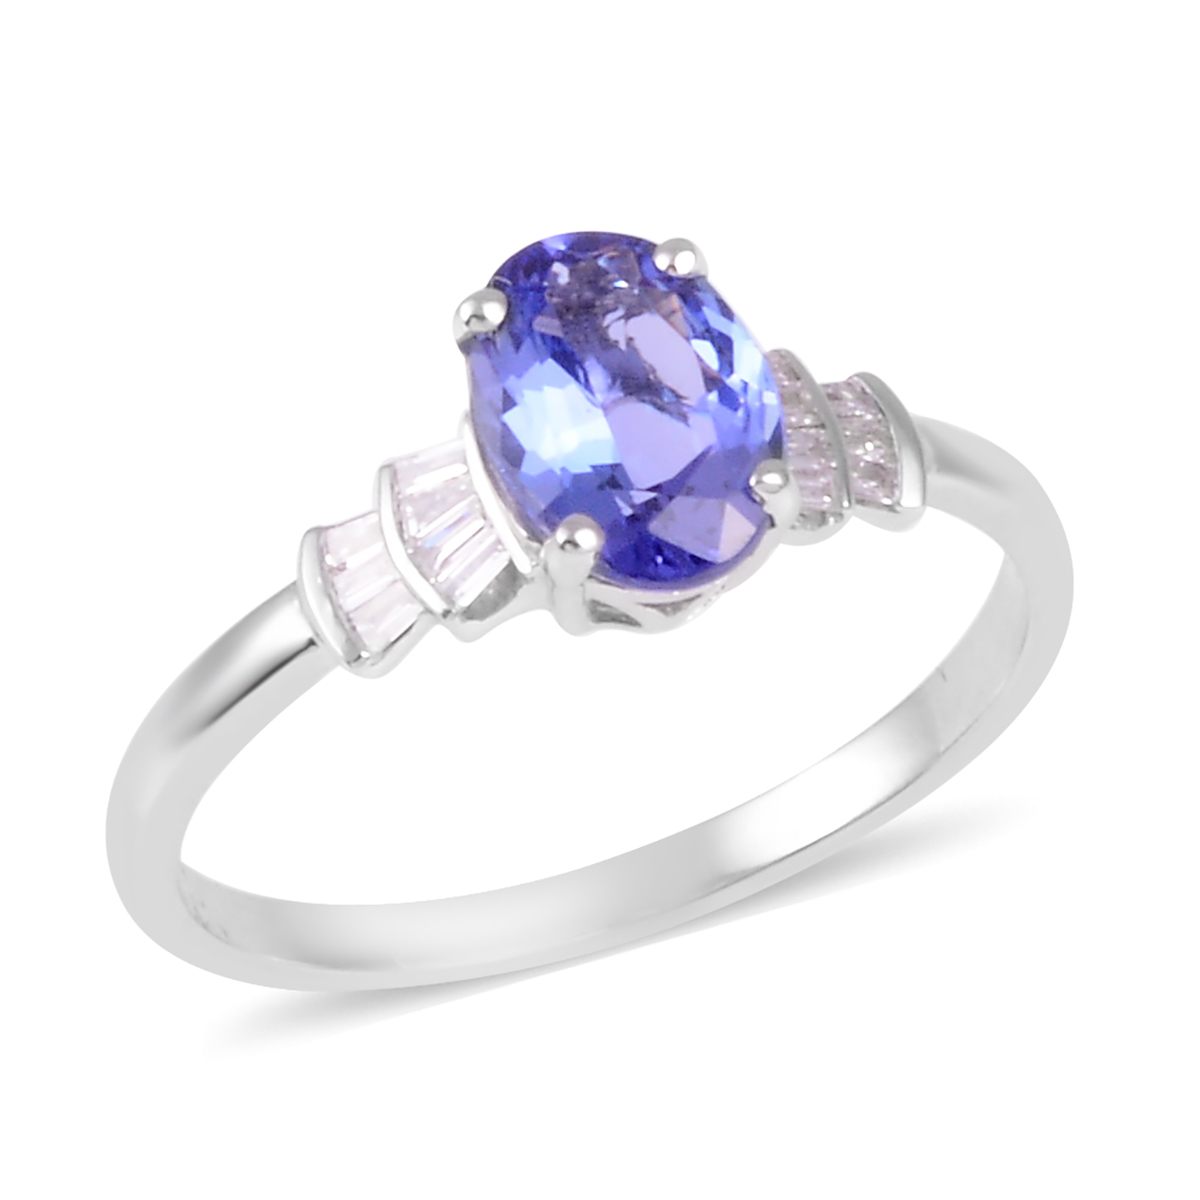 ILIANA AAA Premium Tanzanite, Diamond (0.10 ct) Ring in 18K White Gold (Size 7.0) 1.15 ctw